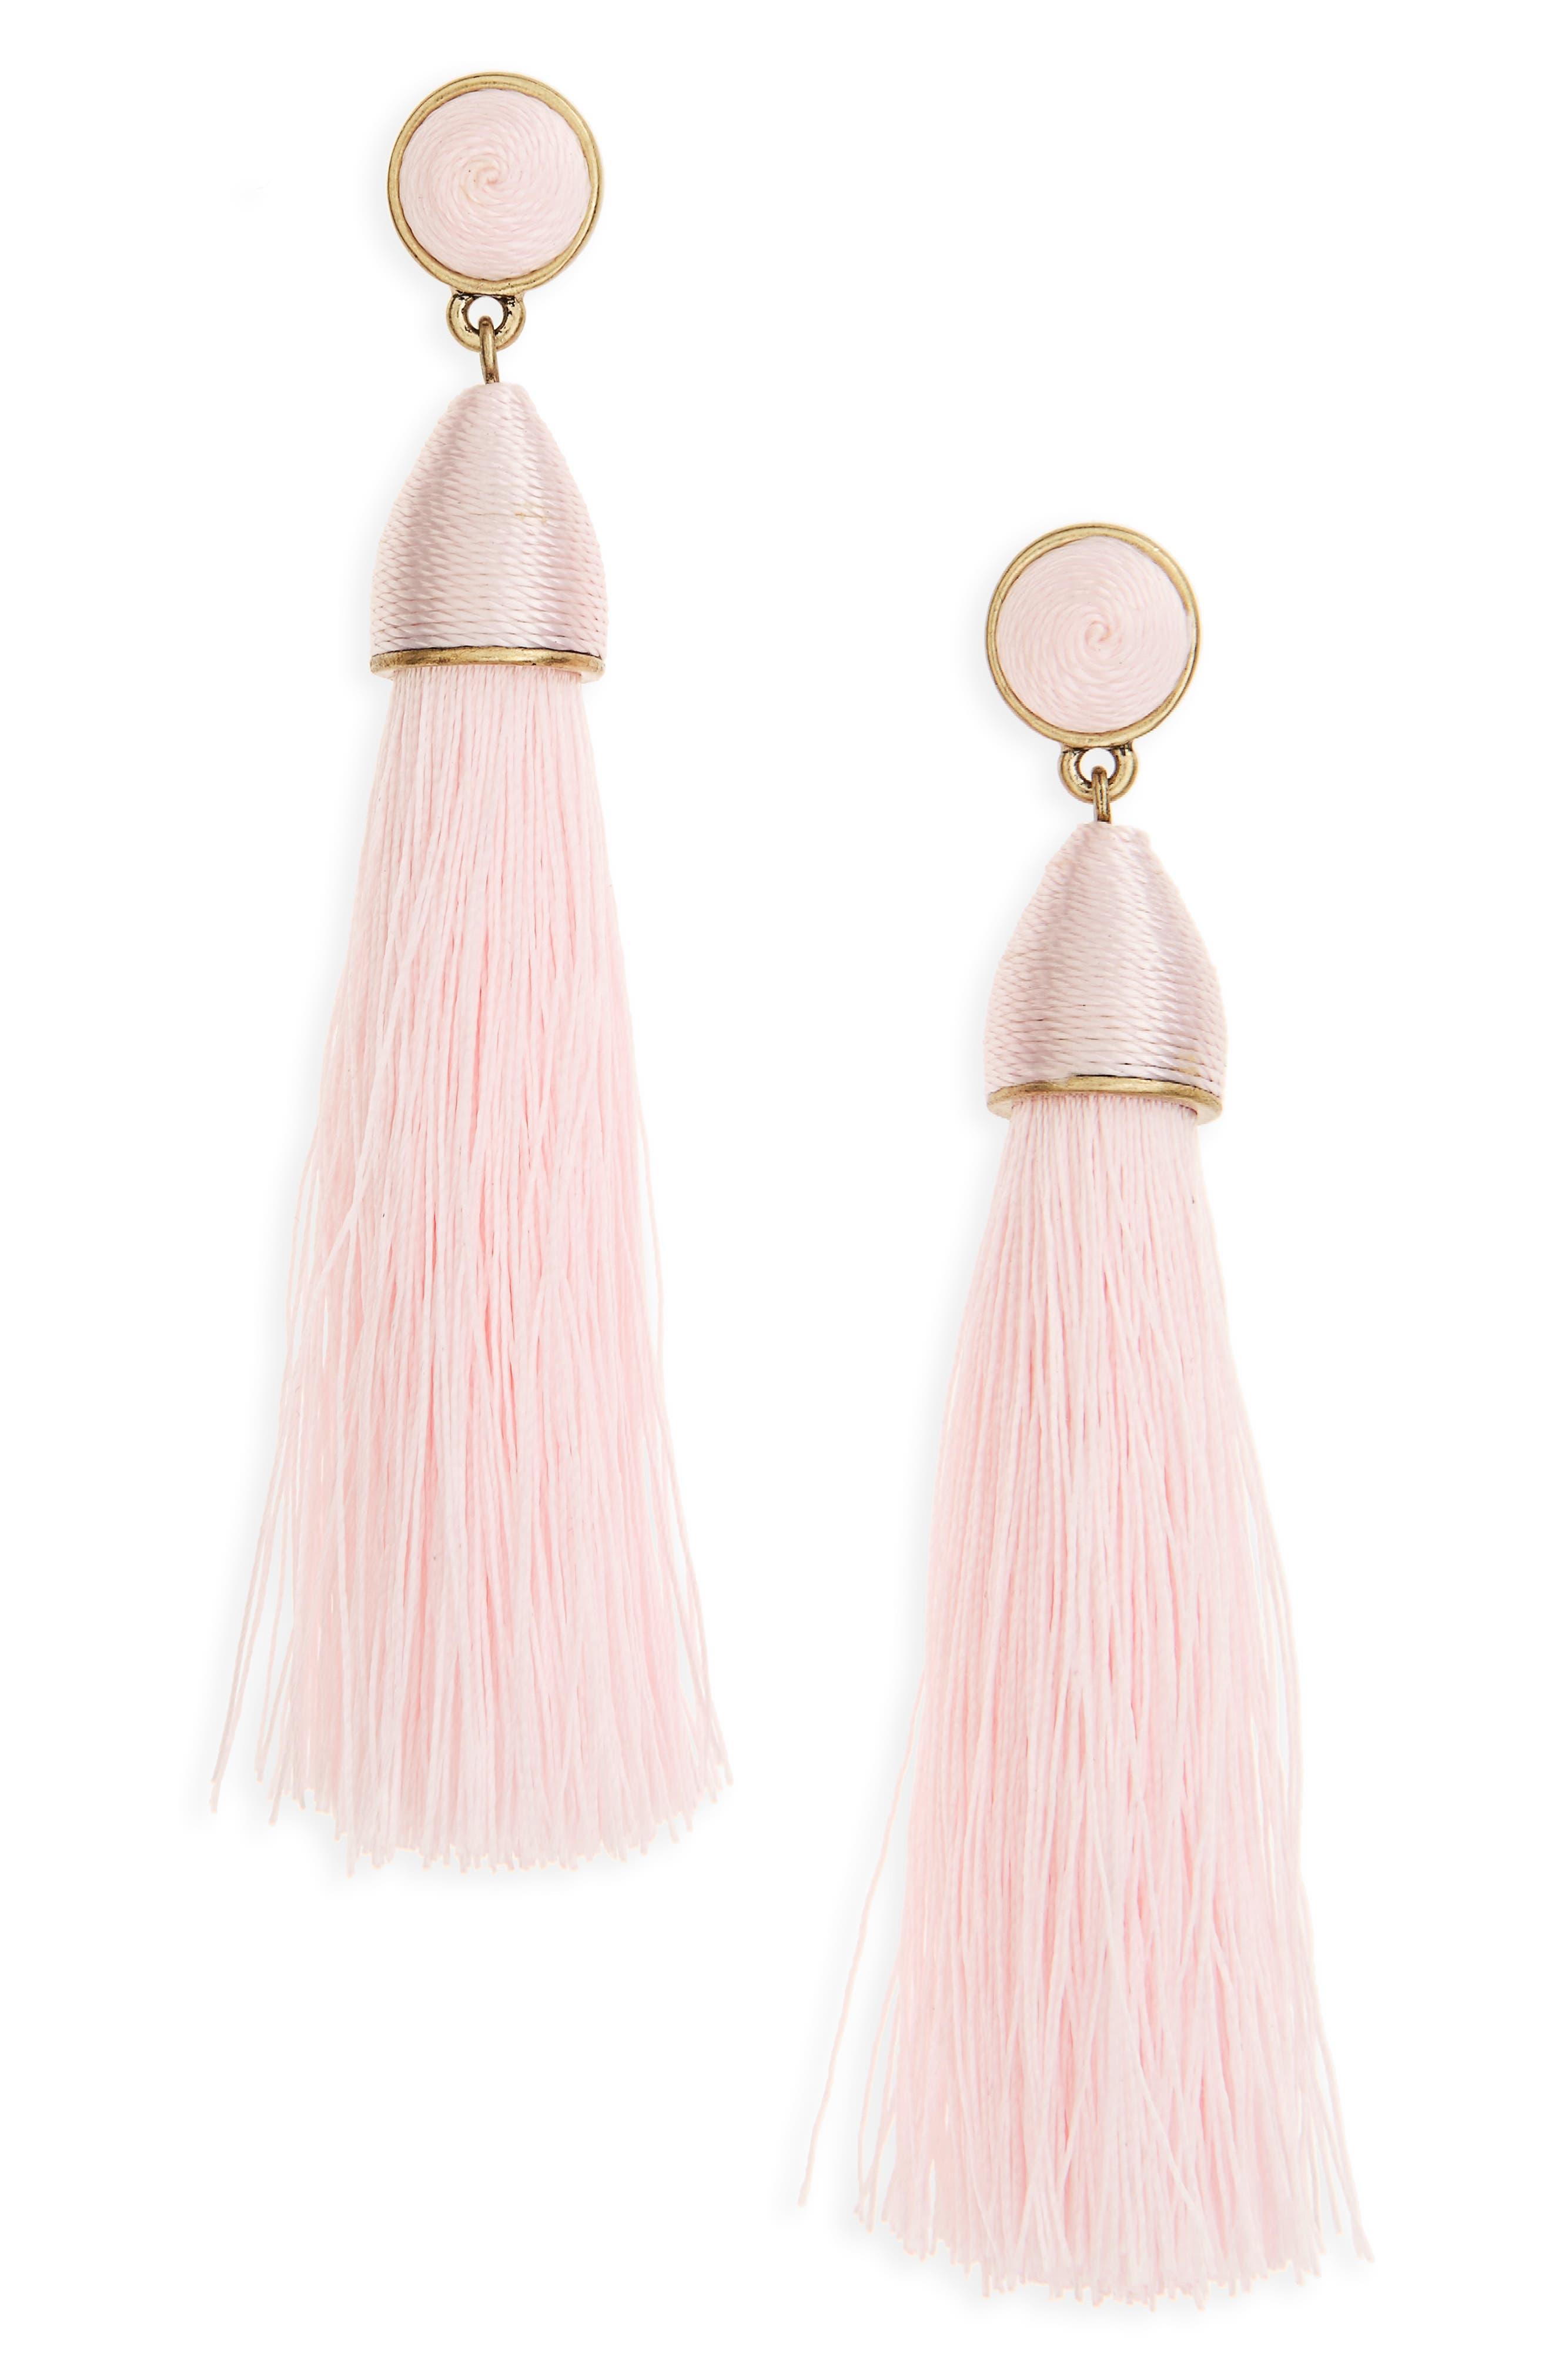 Alternate Image 1 Selected - BaubleBar Rosabella Tassel Drop Earrings